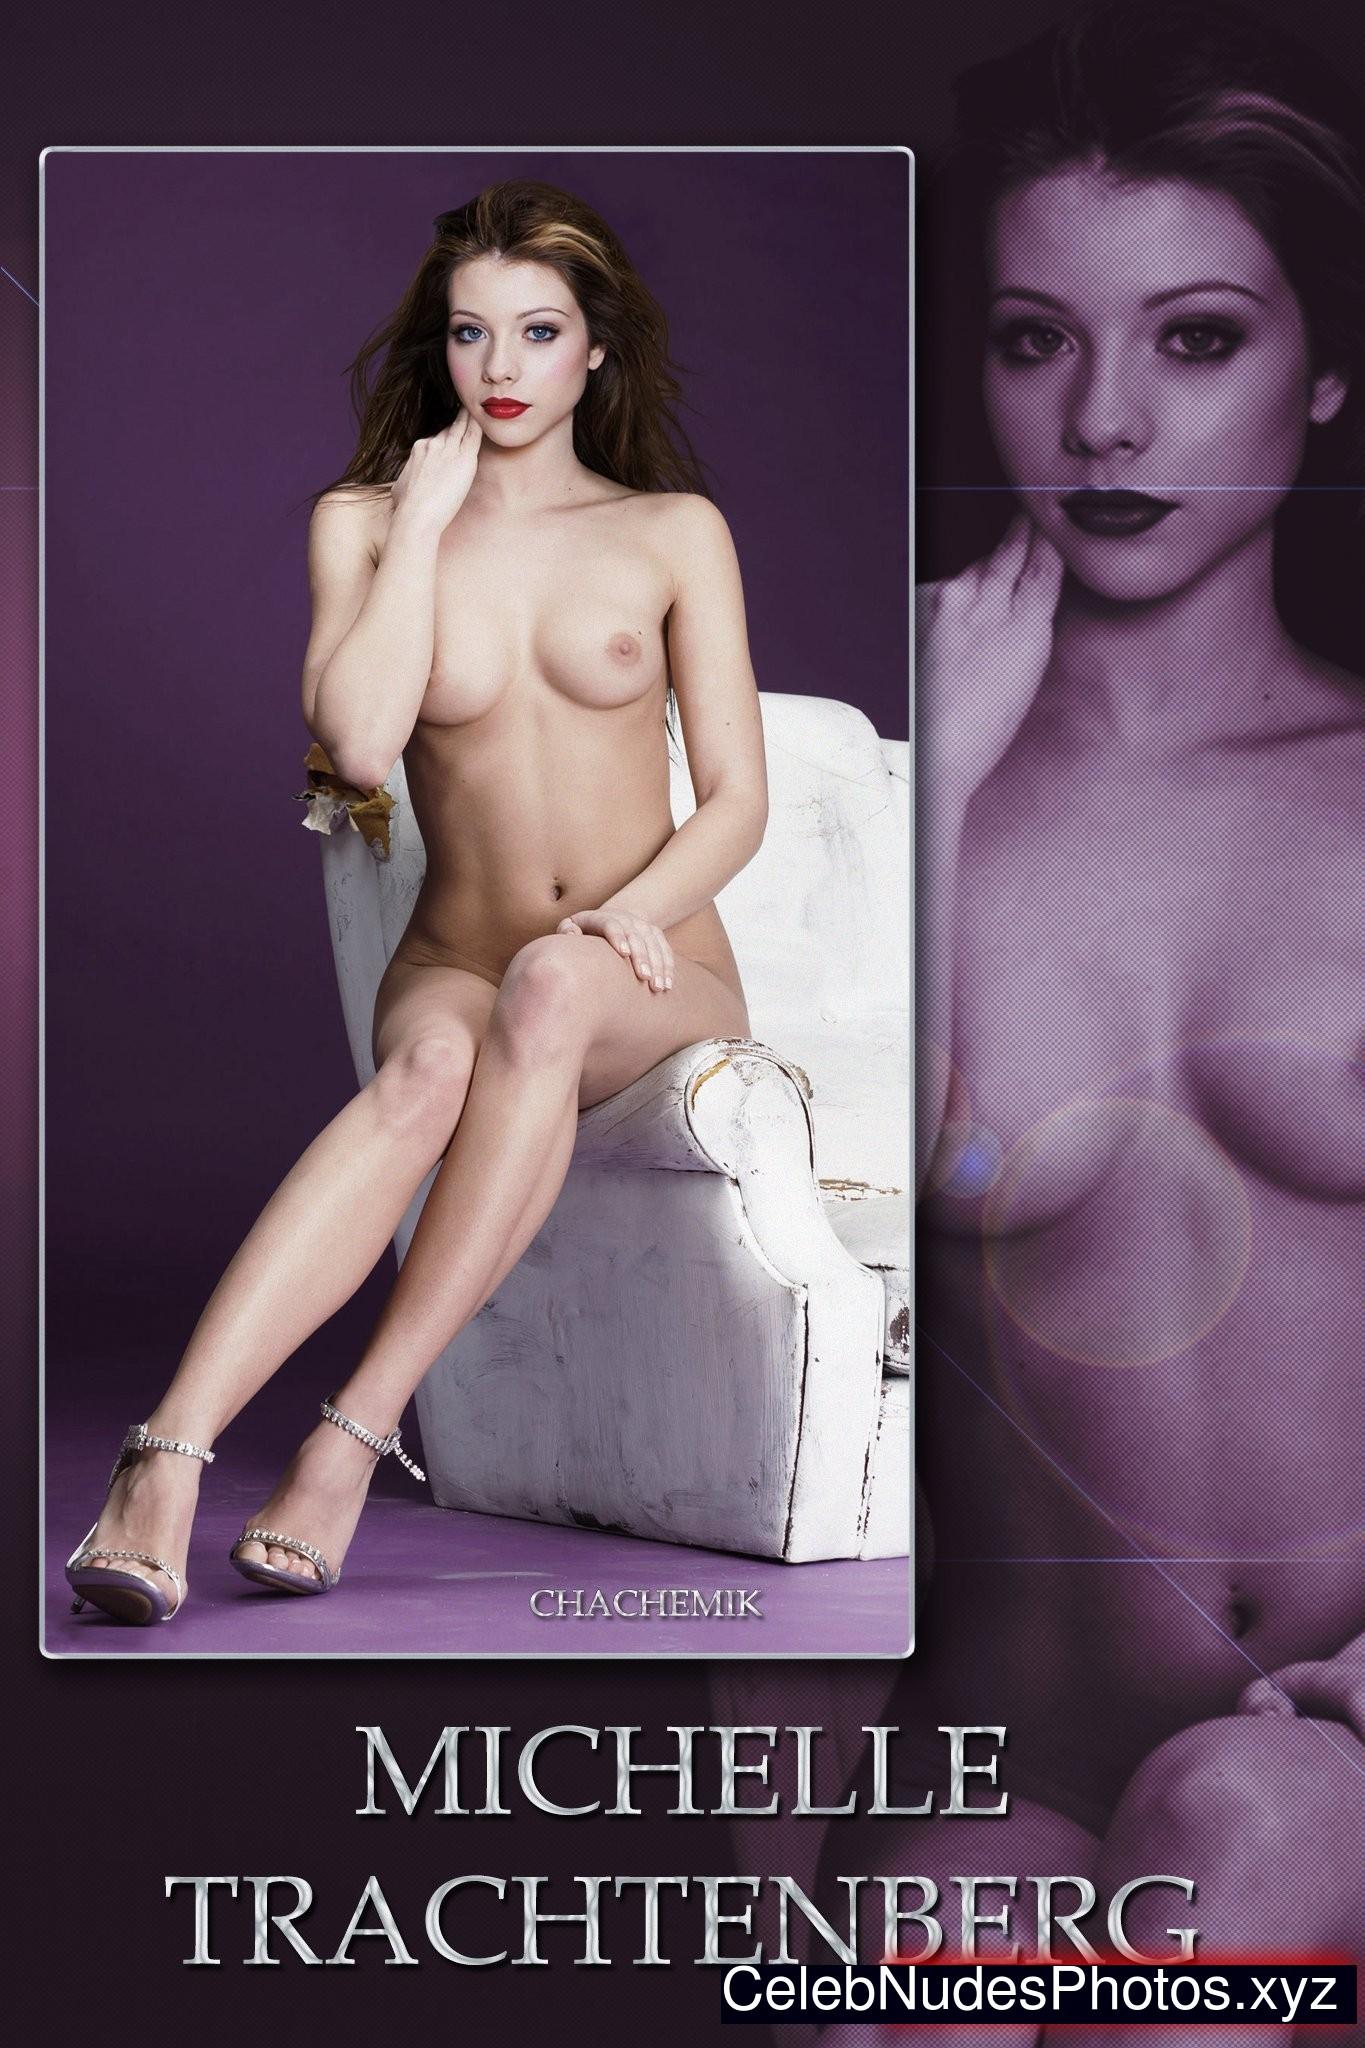 Michelle trachtenberg leaked nude